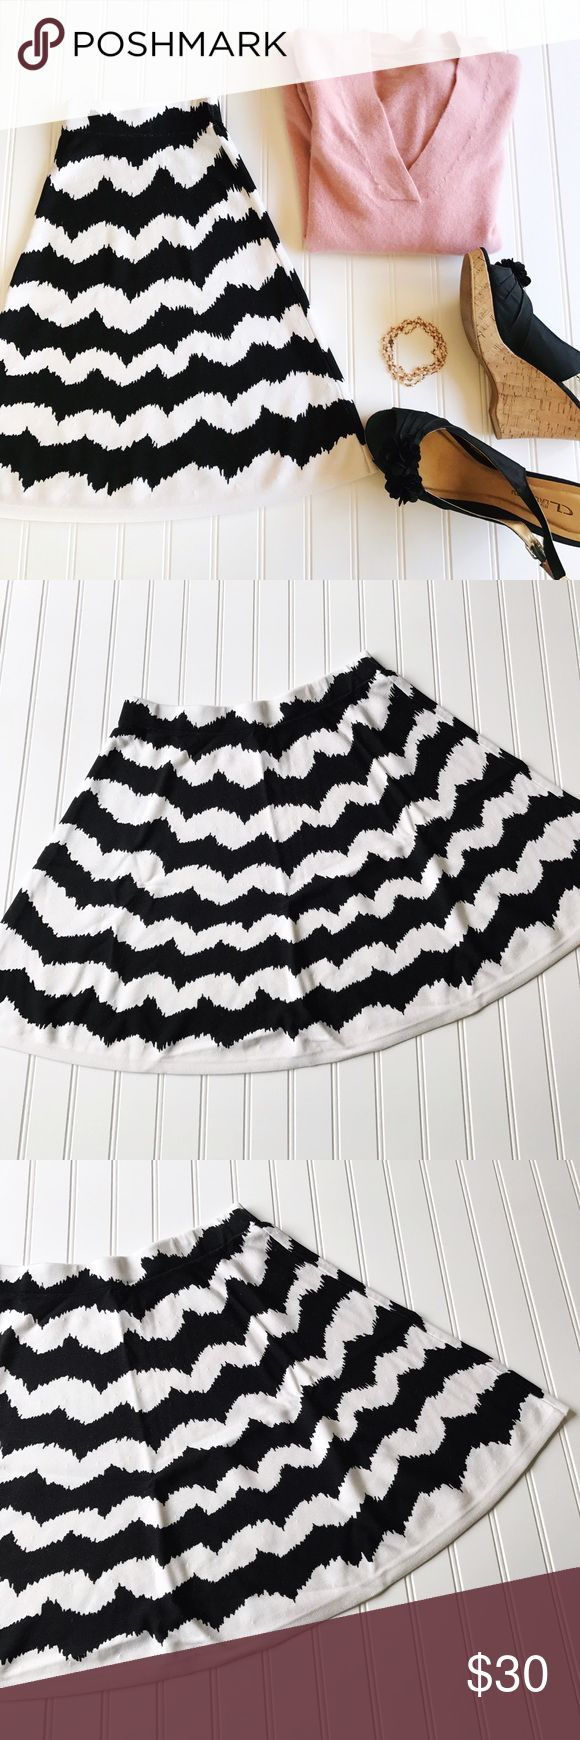 "INC Black And White Circle Skirt INC International Concepts Black And White Circle Skirt.  No rips or stains.  Waist 30"" Length 19"" INC International Concepts Skirts Circle & Skater"